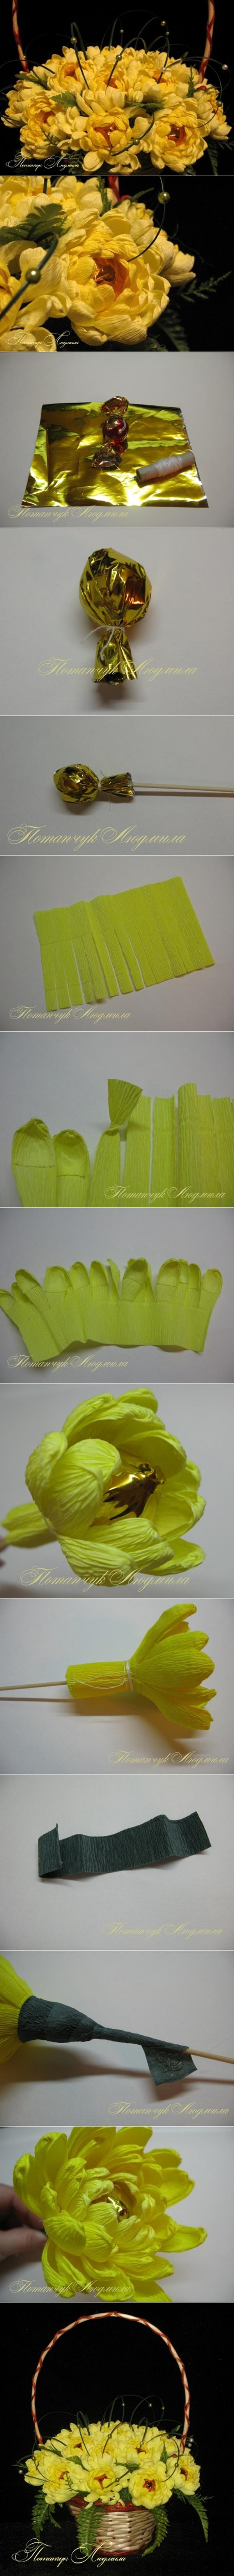 chrysanthemum flower bouquet tutorial